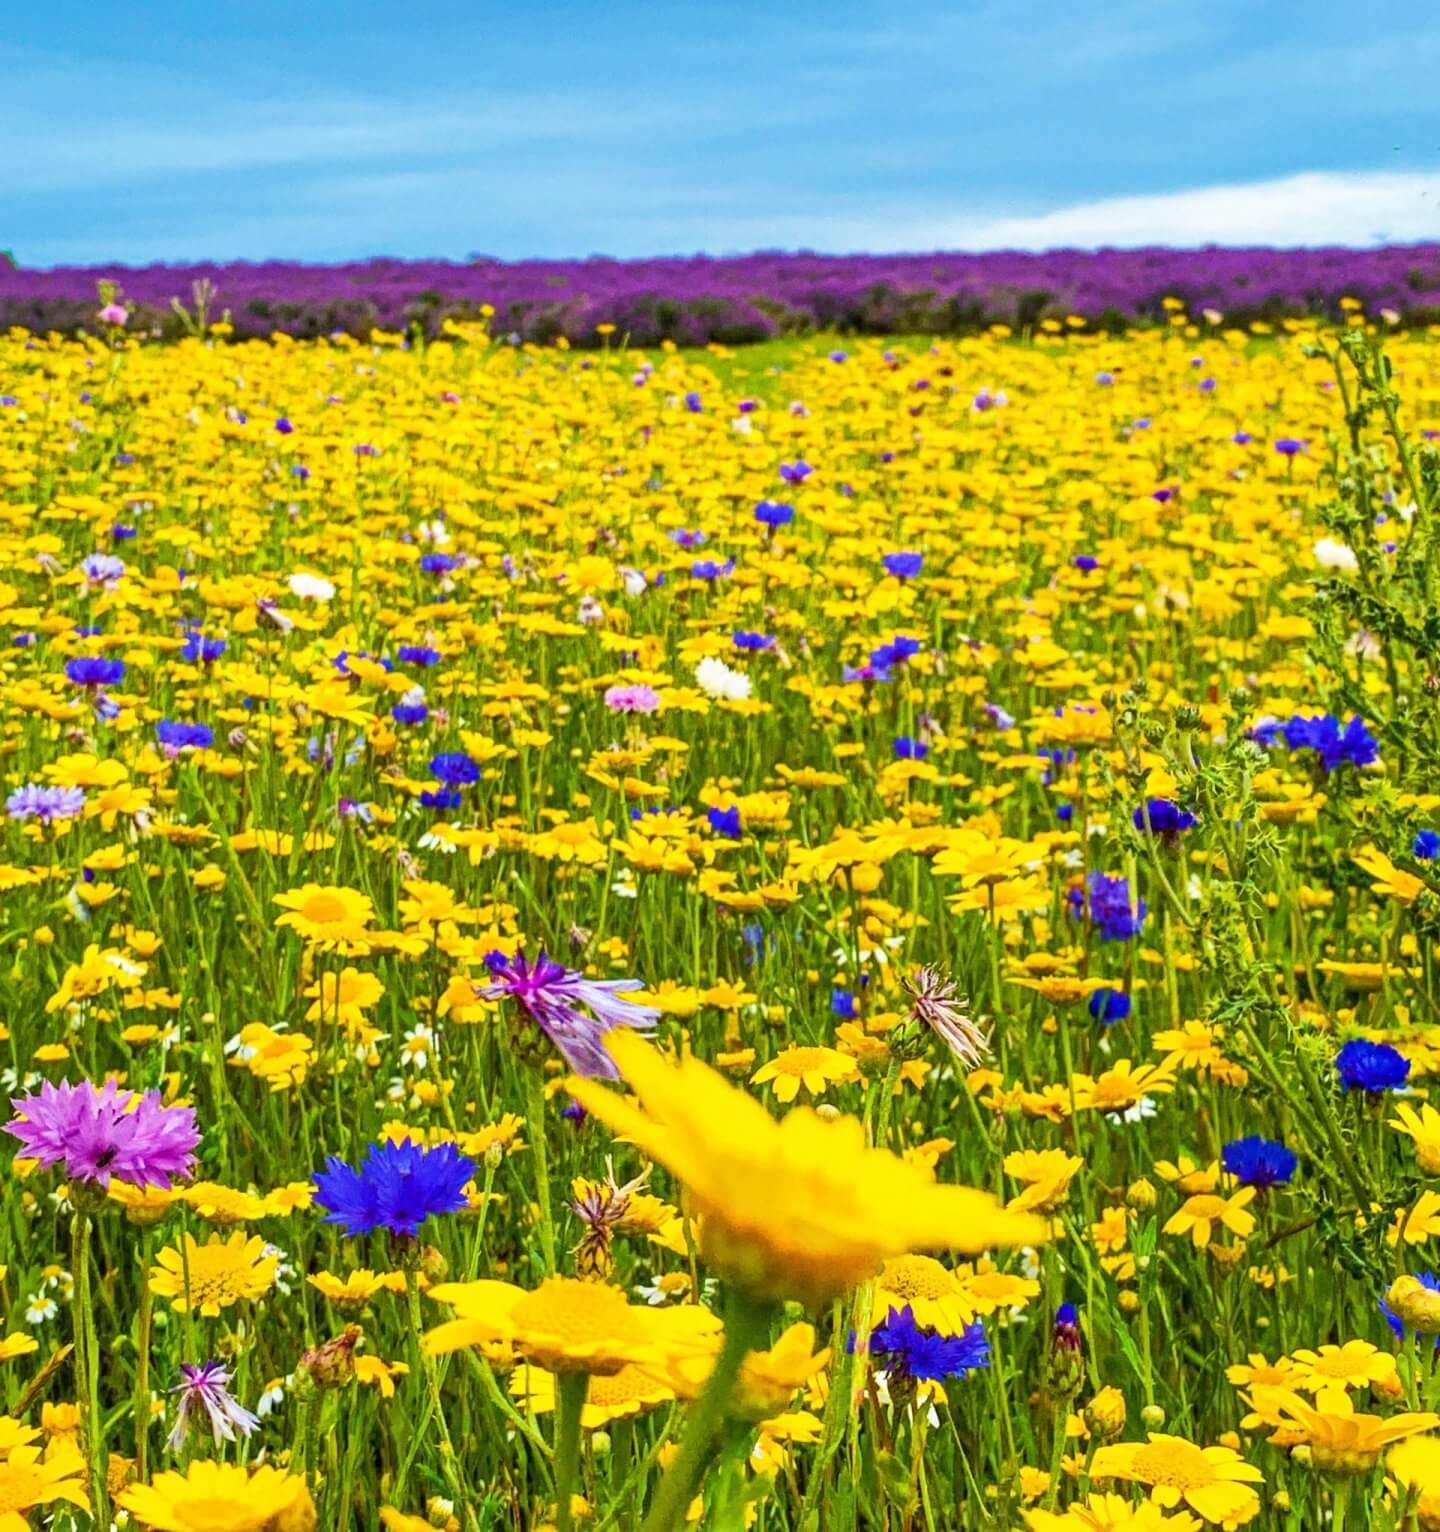 Cotswold Lavender farm, Snowshill